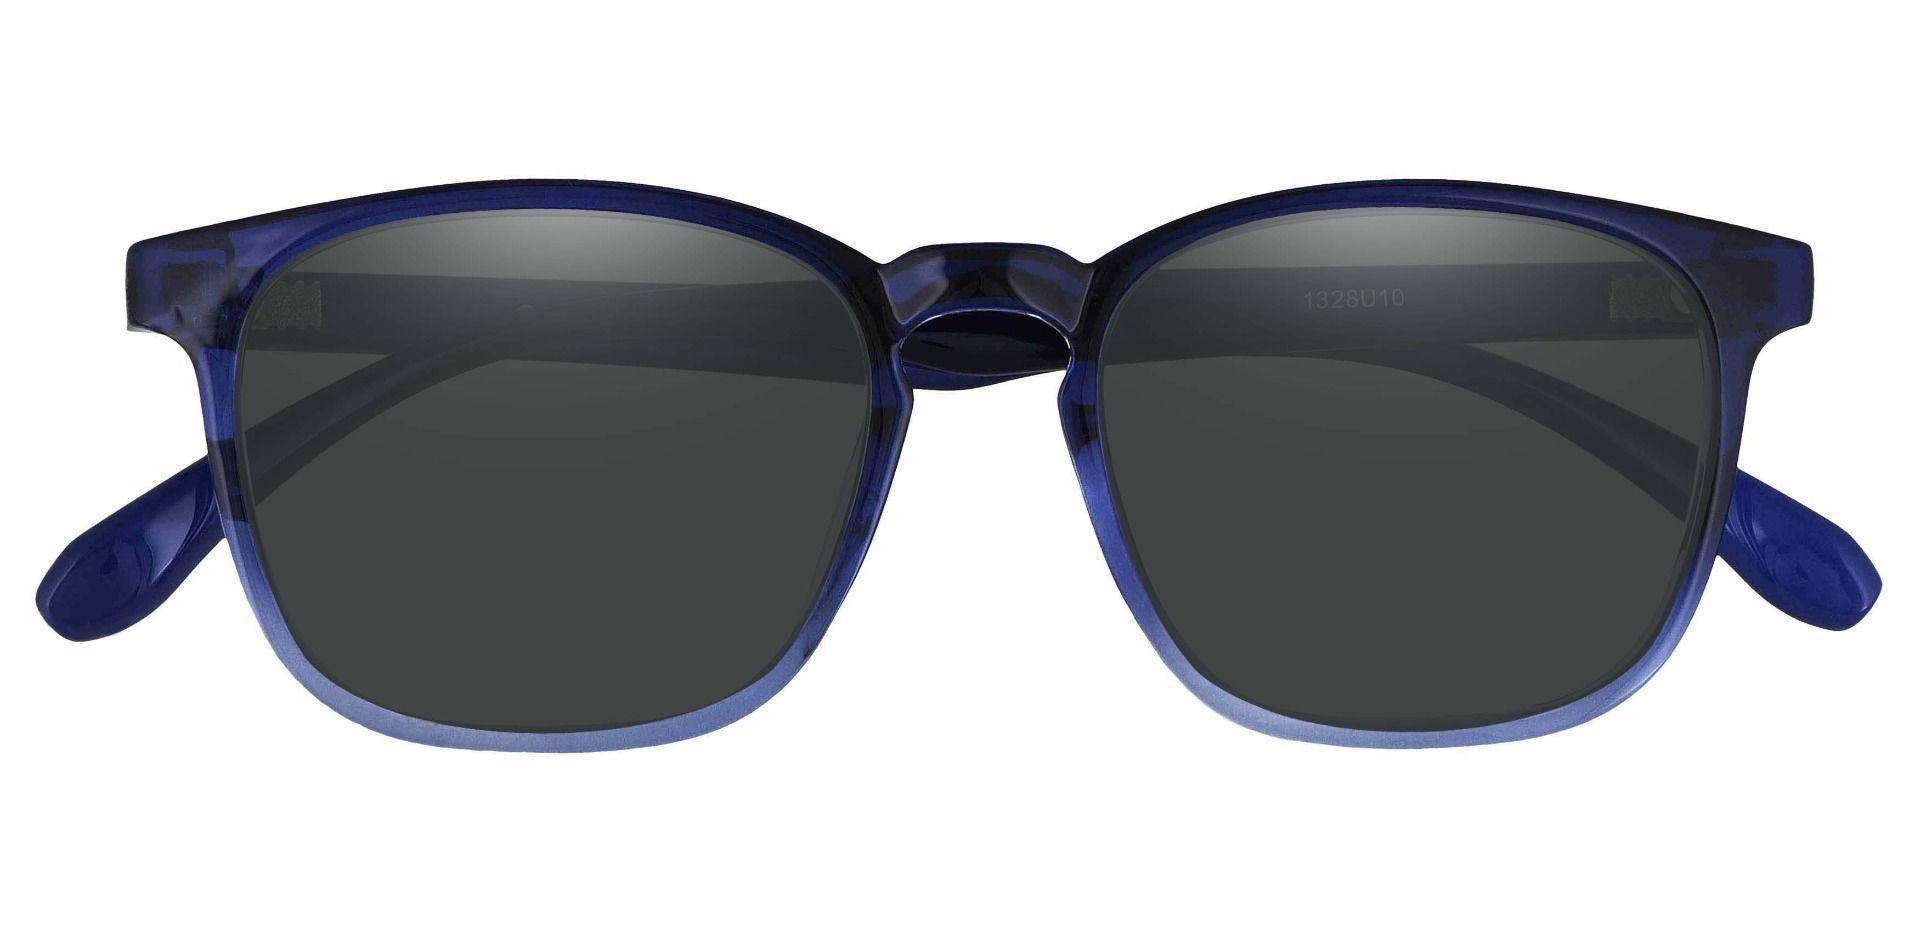 Dusk Classic Square Prescription Sunglasses - Blue Frame With Gray Lenses